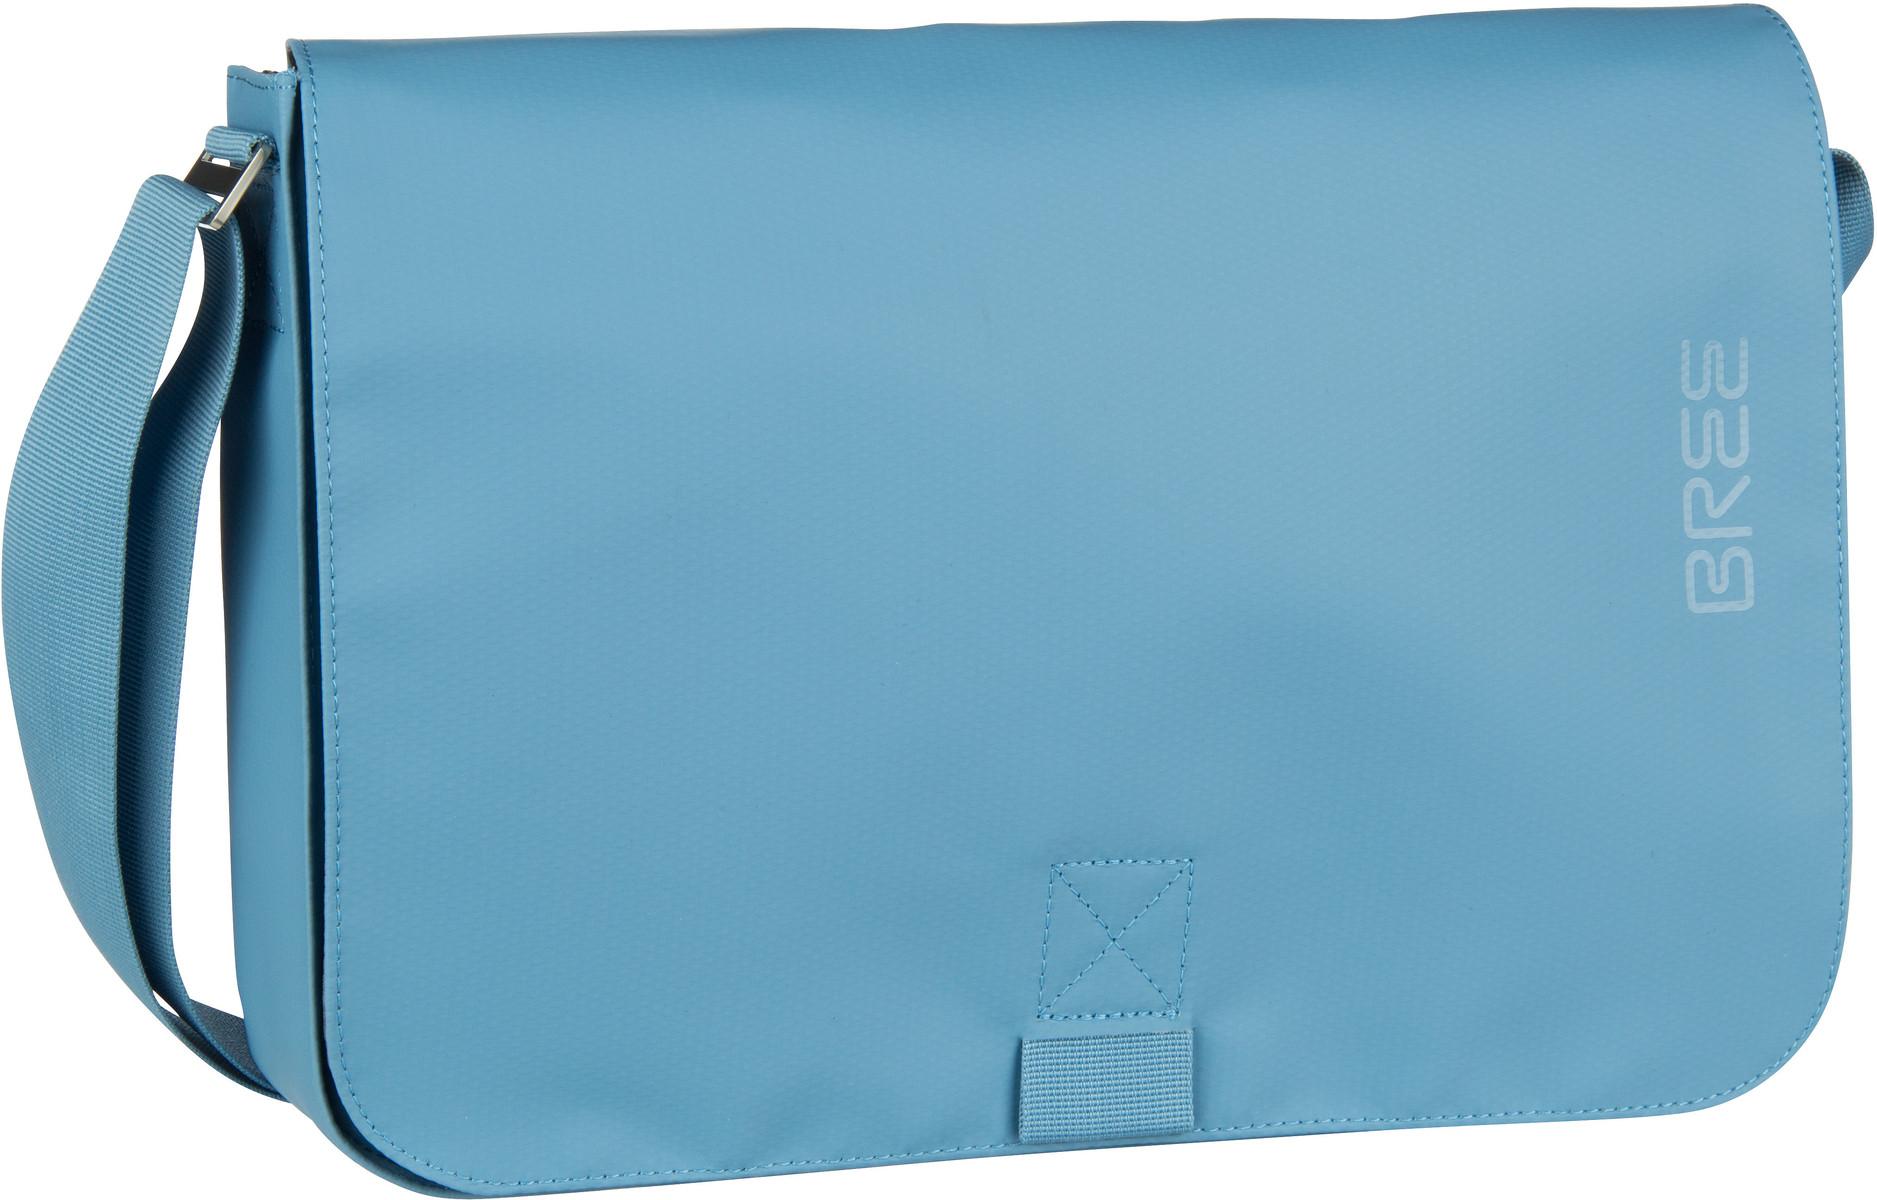 Umhängetasche Punch 62 Provencal Blue (innen: Grau)